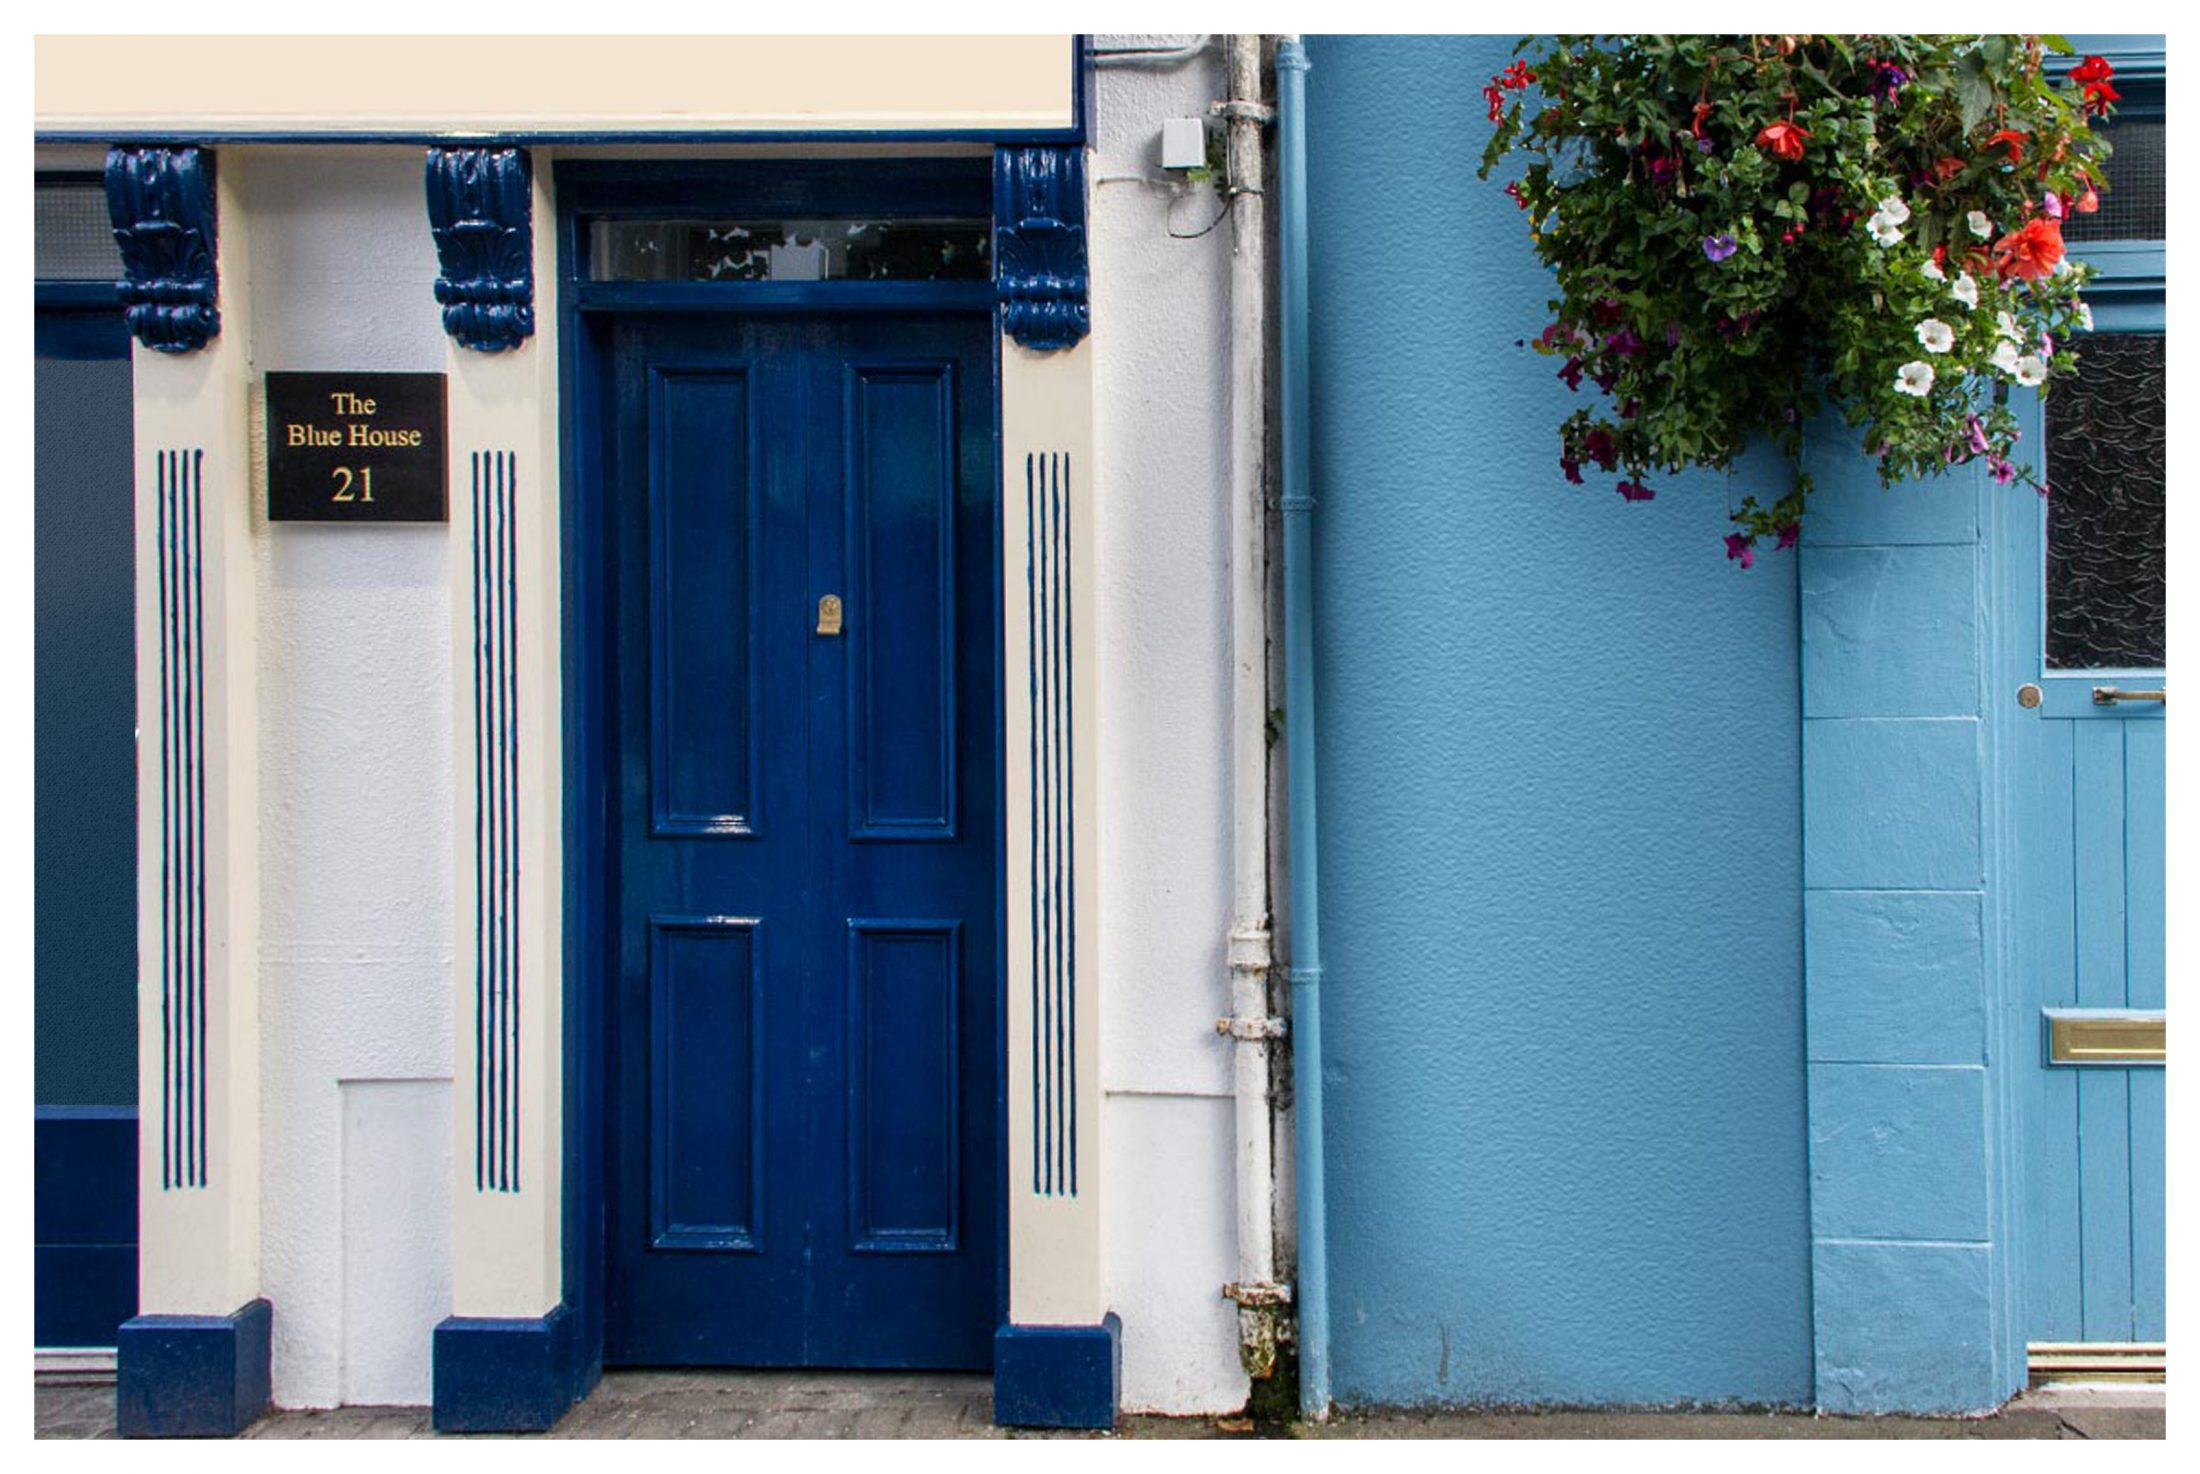 M006 The Blue House Westport